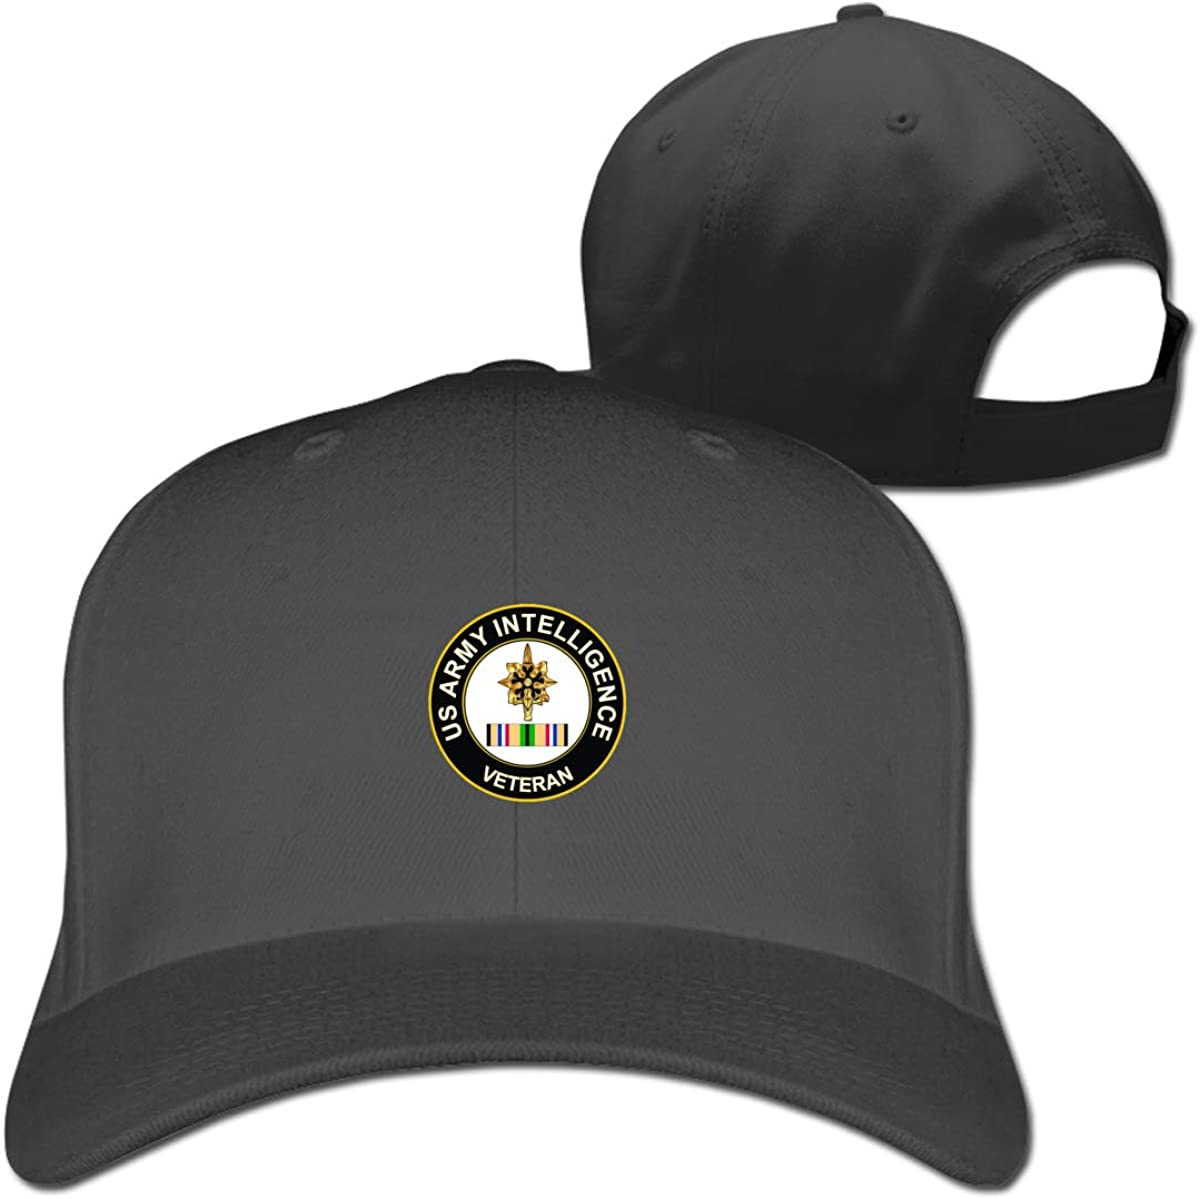 Kibio Military Vet Shop Magnet US Army Intelligence Corps Gulf War Veteran Cap Baseball Hat Adjustable Black